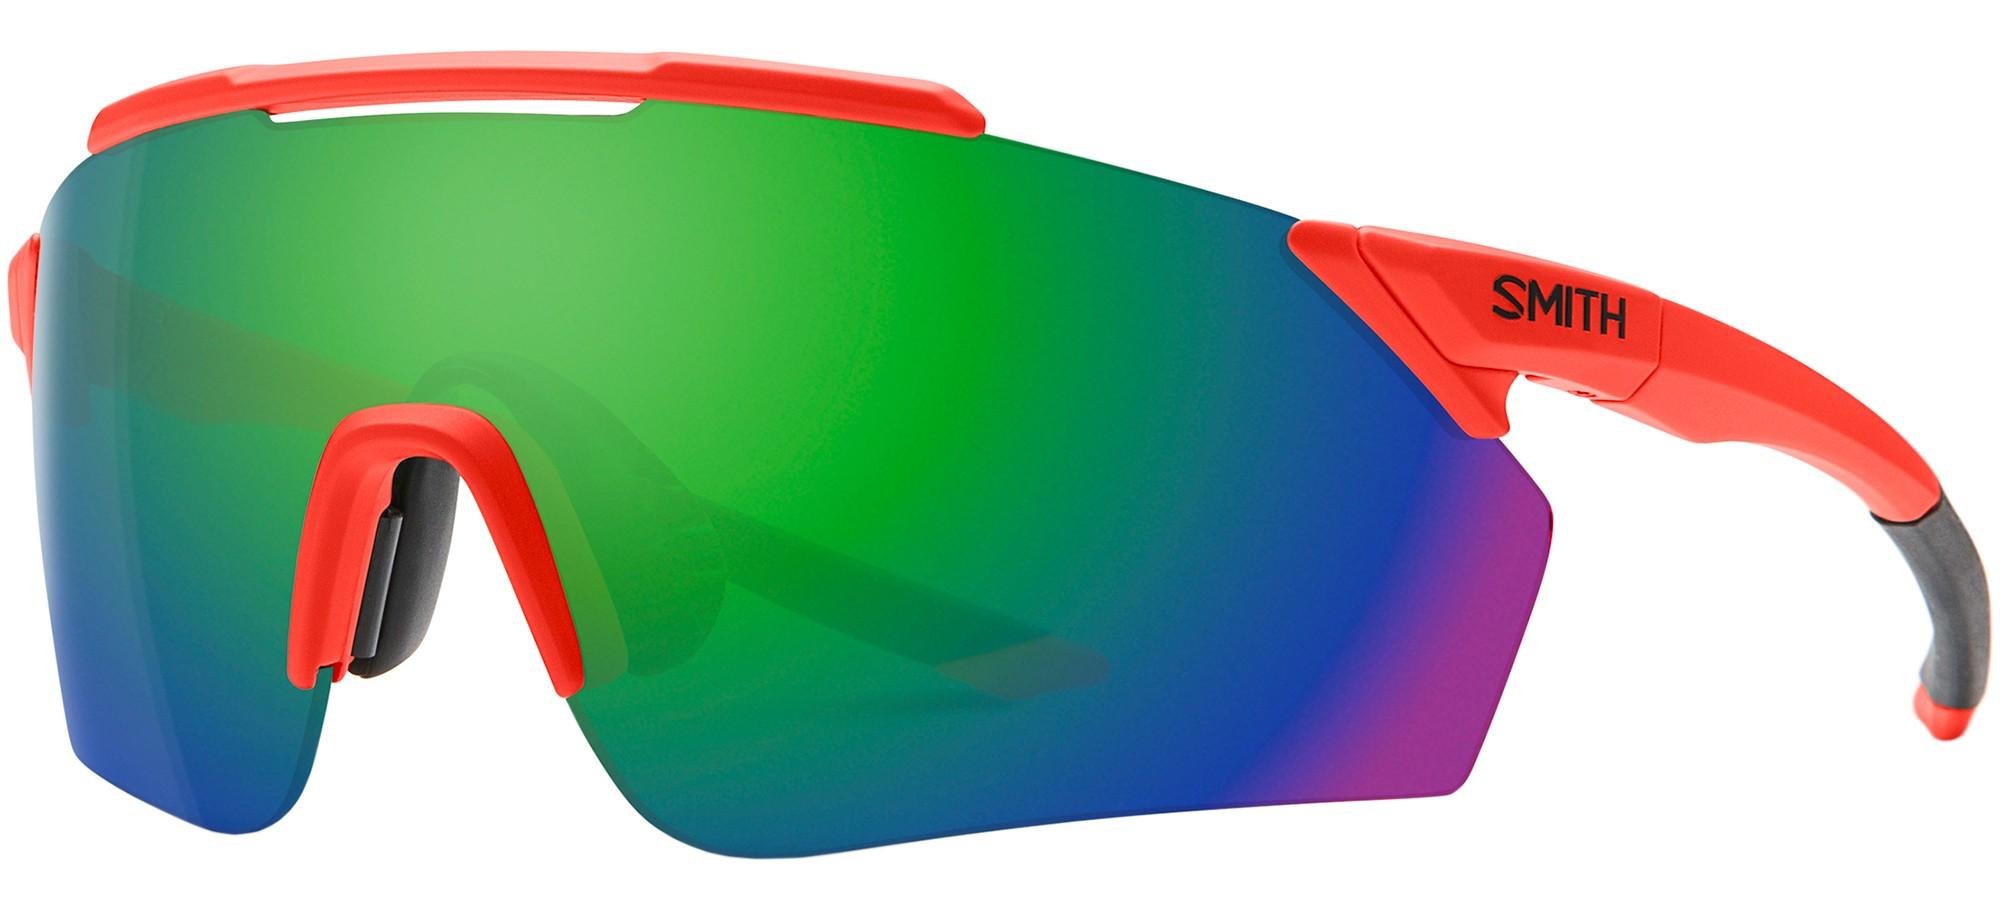 Smith Optics zonnebrillen RUCKUS